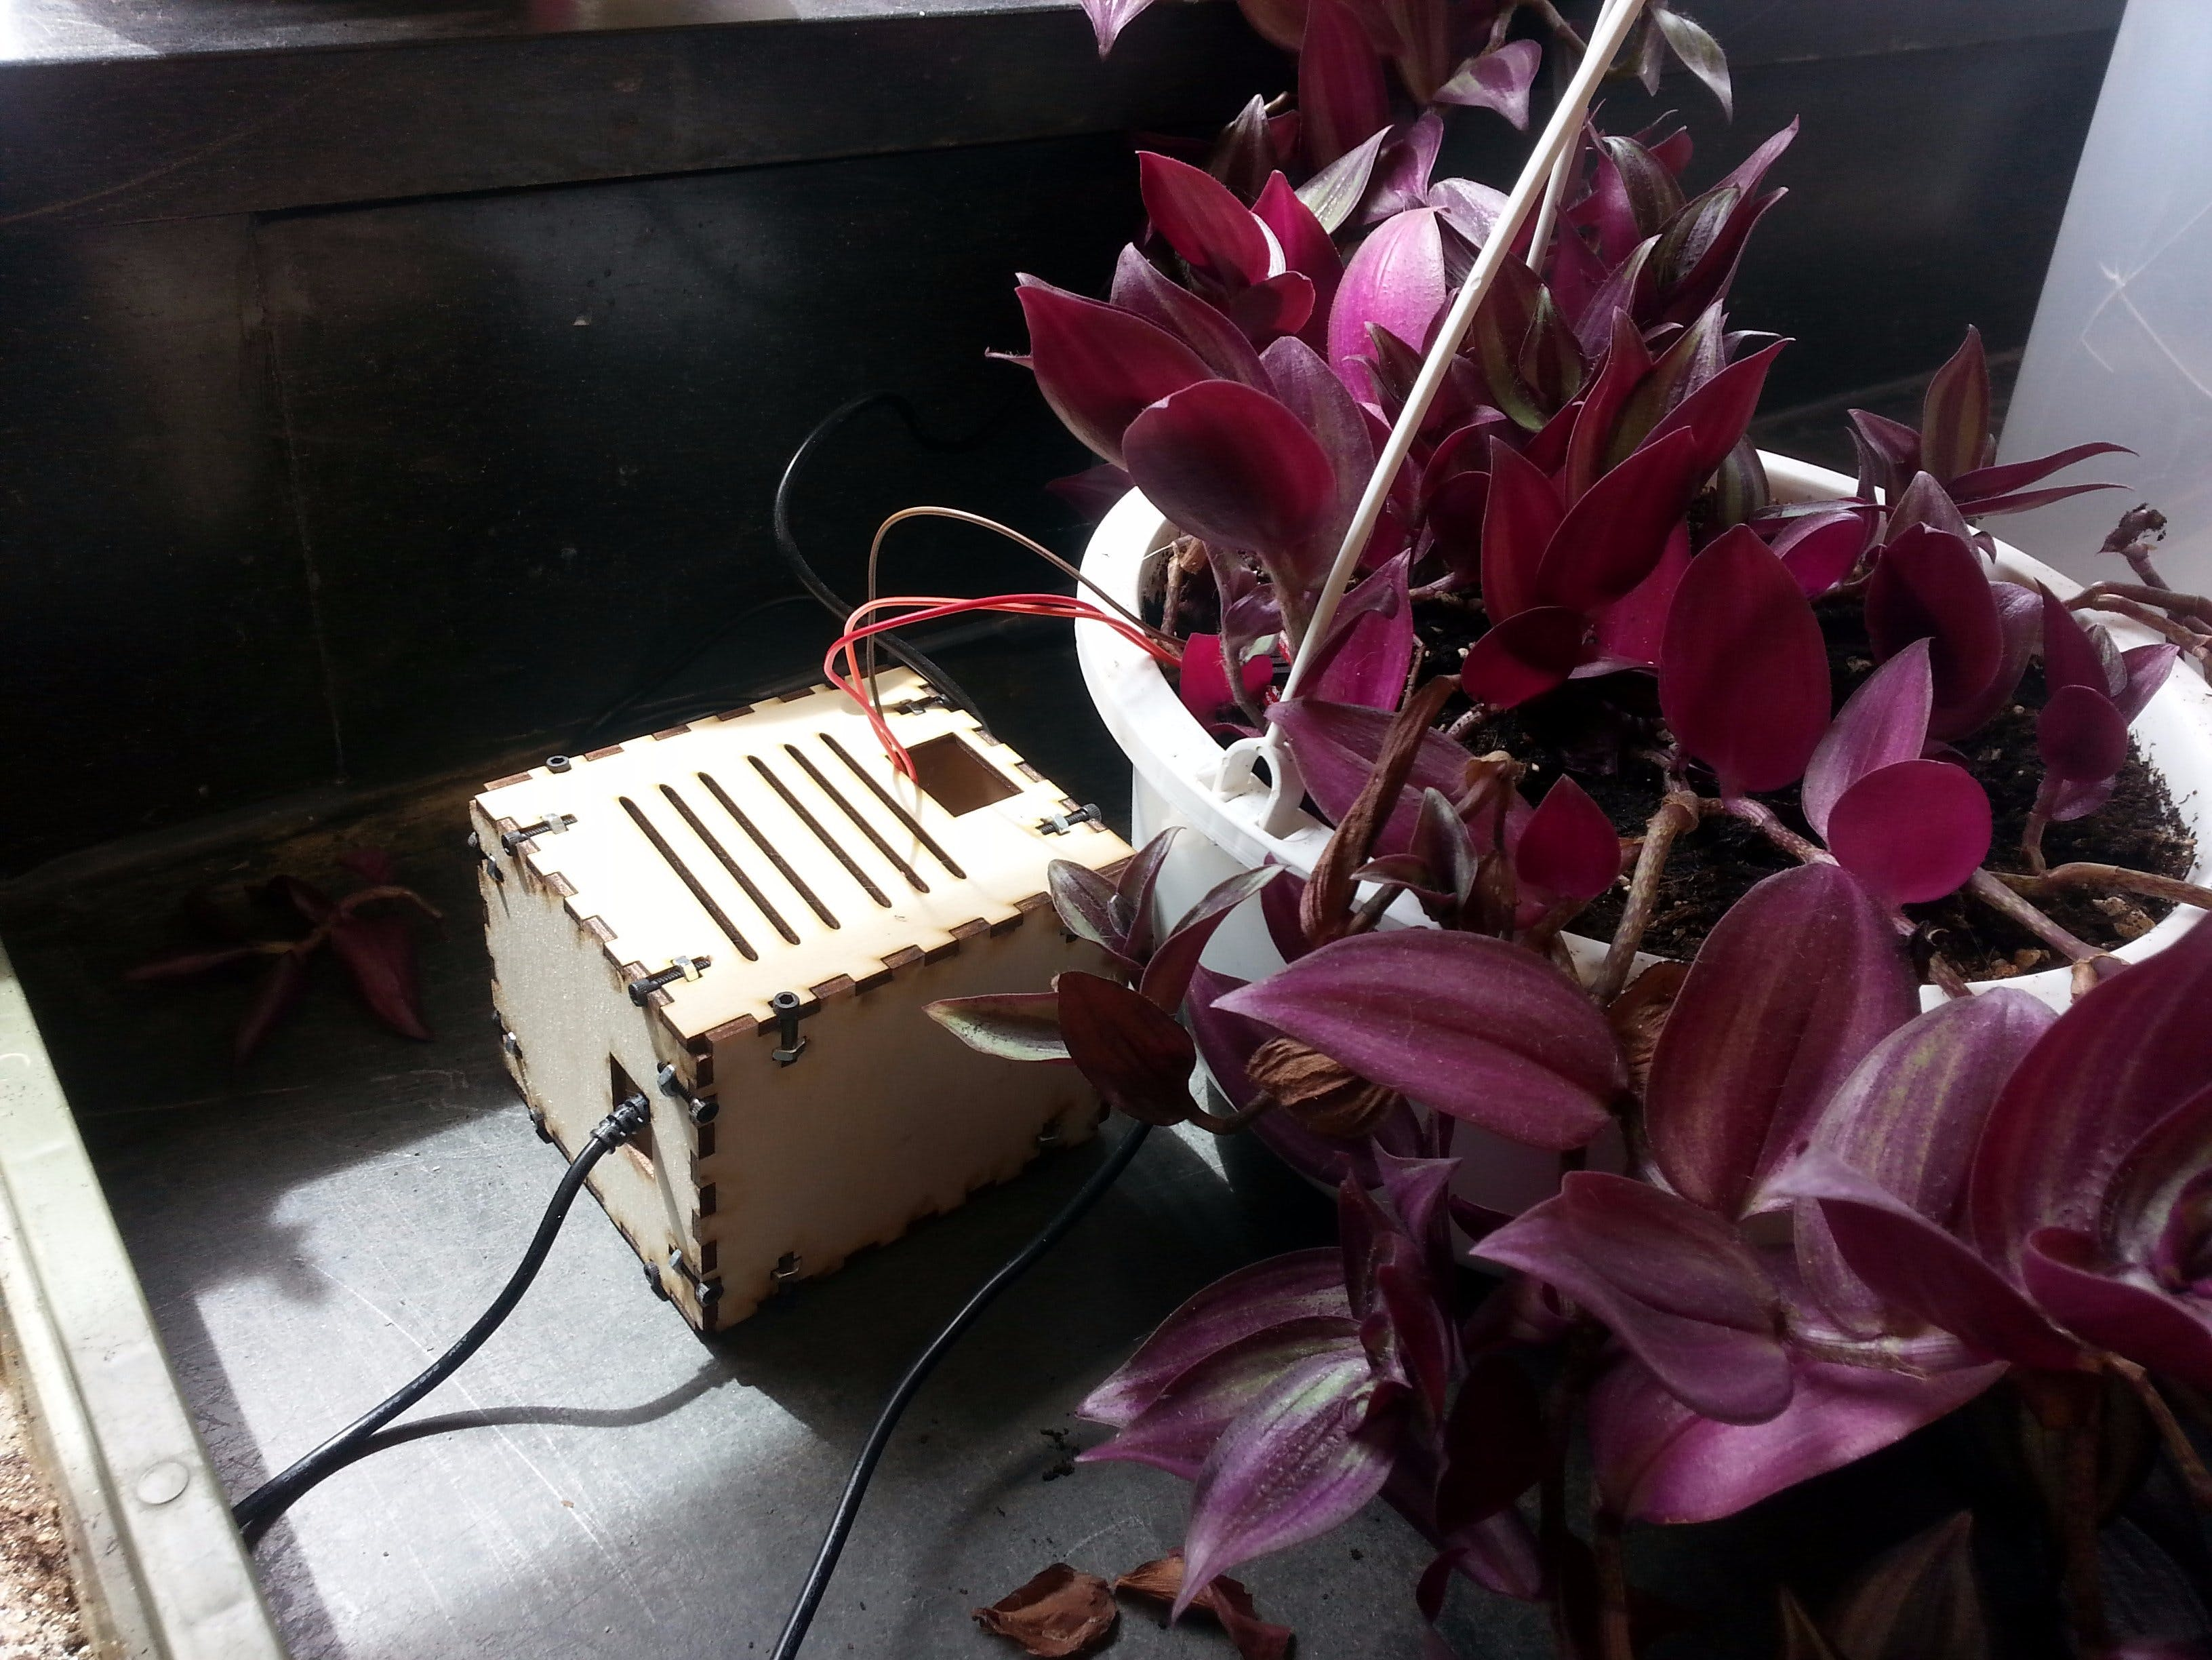 Greenhouse Temperature/Humidity and Soil Moisture Sensor